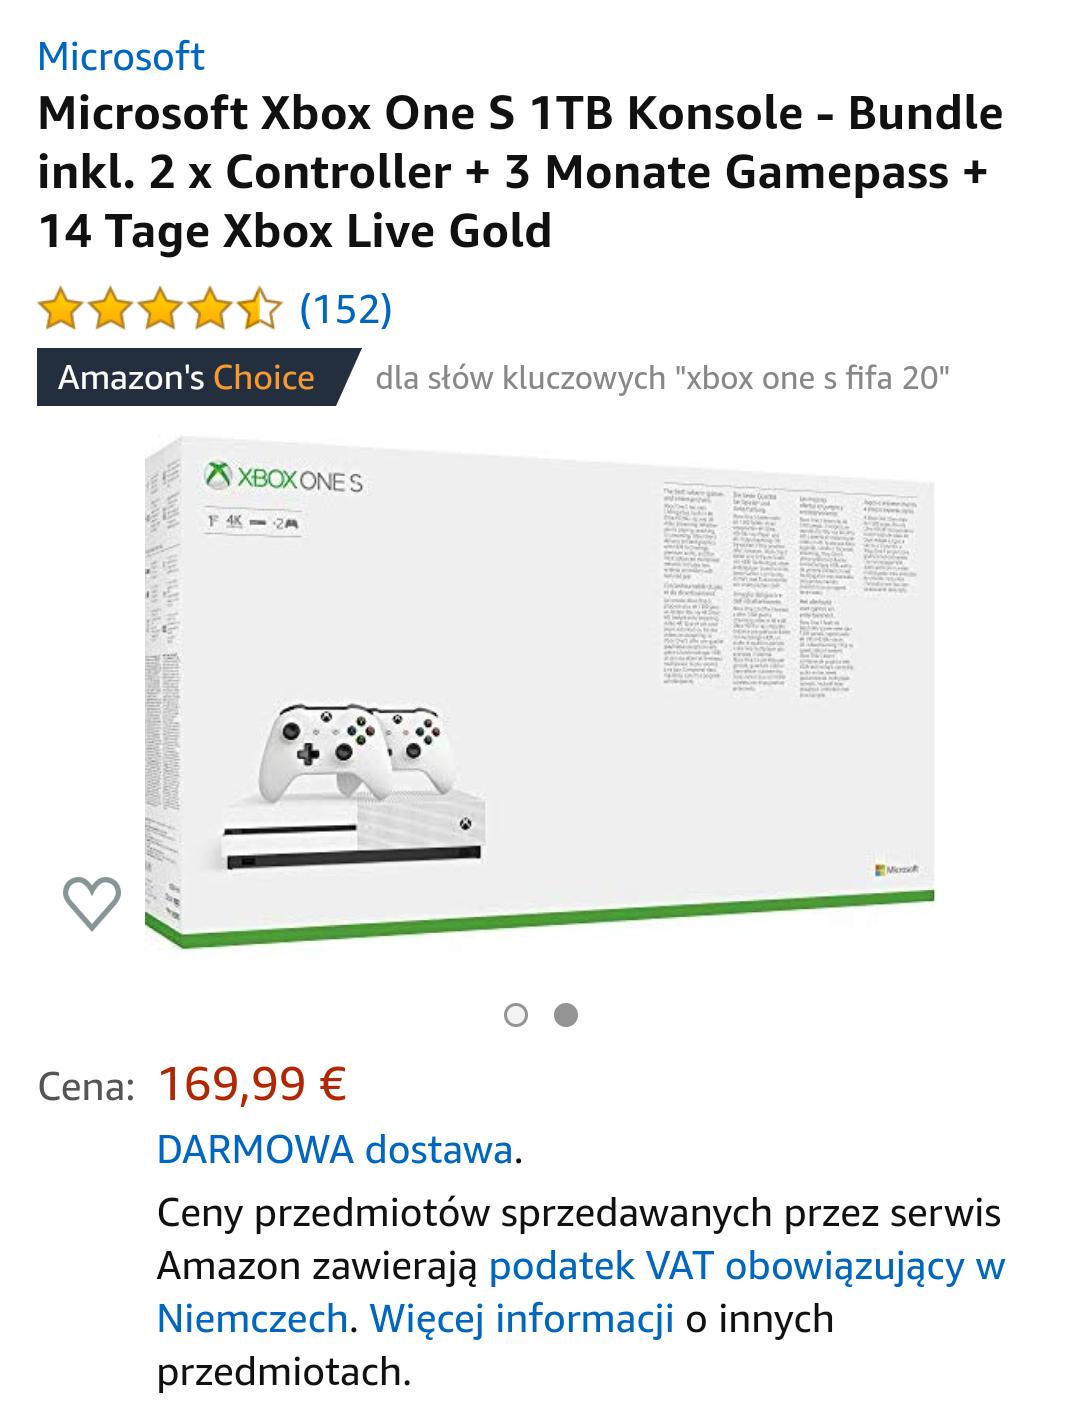 Microsoft Xbox One S 1TB 2pady + 3 miesiące Gamepass + 14 dni Xbox Live Gold